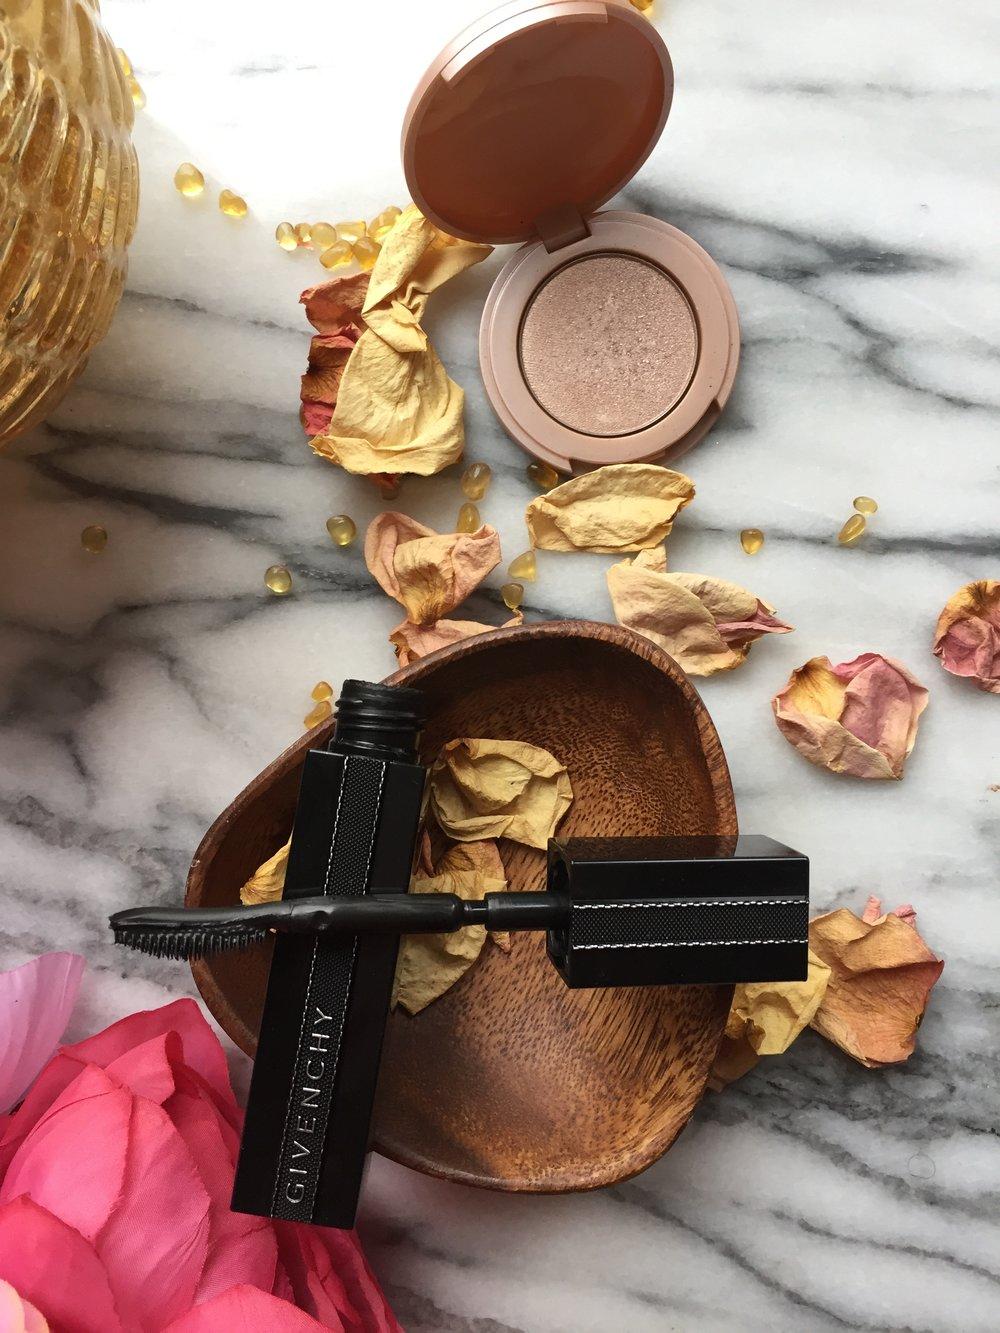 Givenchy Noir Interdit Mascara and Tarte Stunner Highlighter